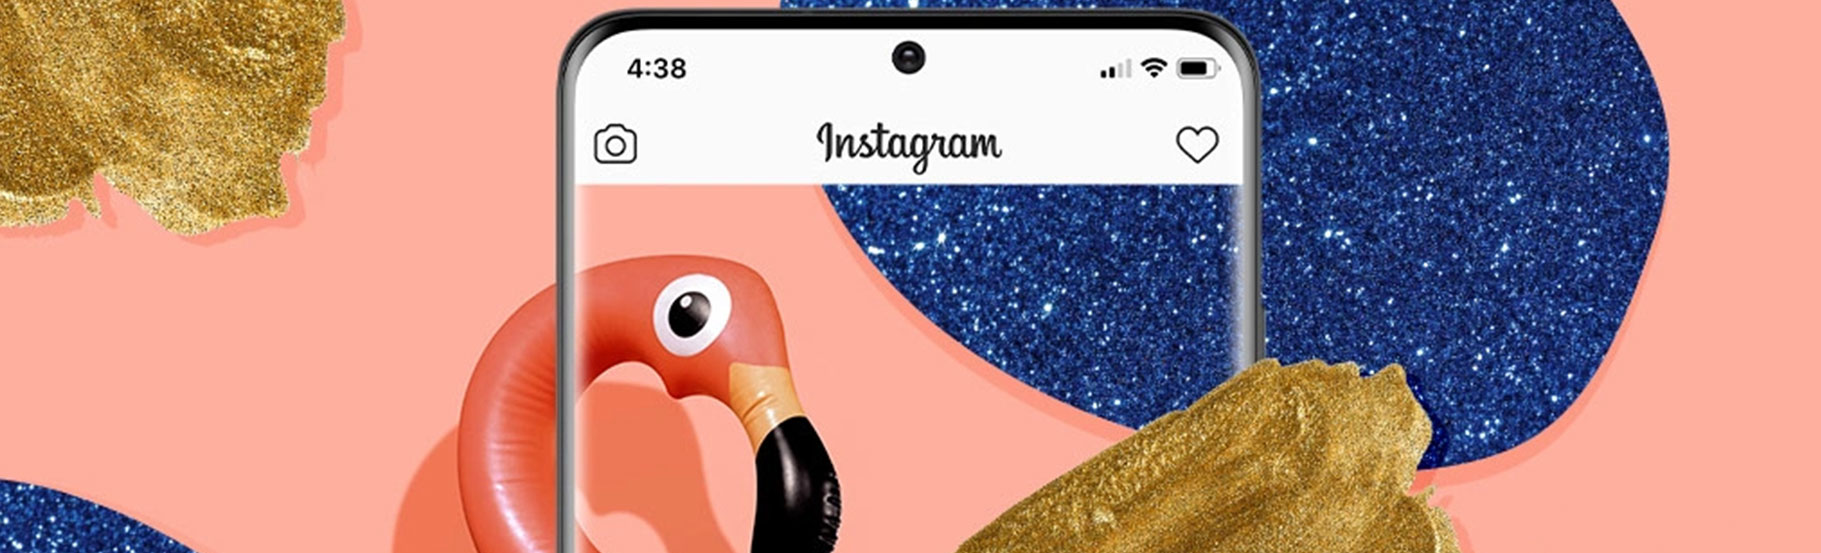 Ekran belog mobilnog telefona i rozi flamingos